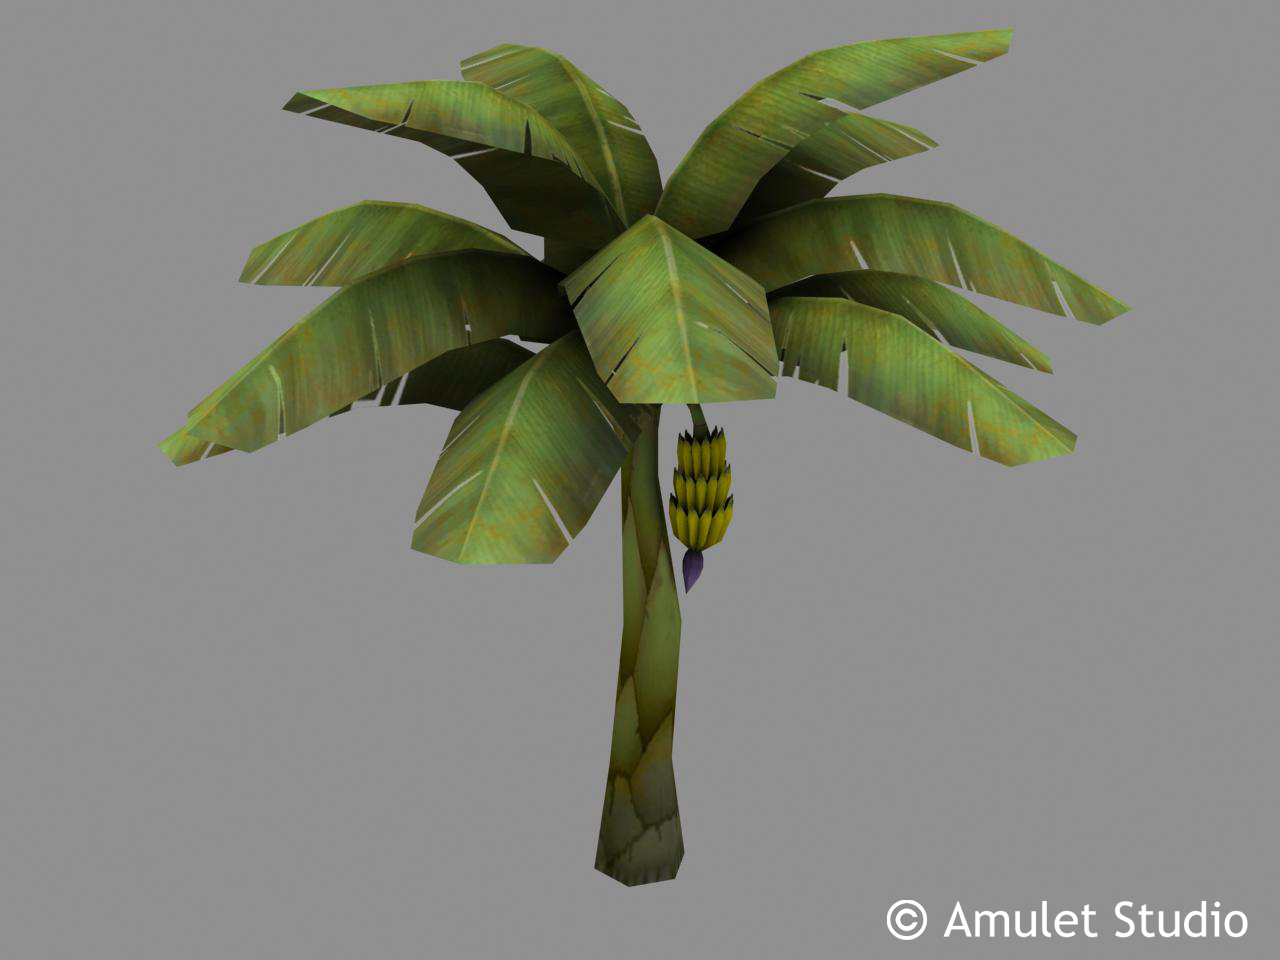 art objects flowers plants banana tree c amulet studio add a comment 1280x960